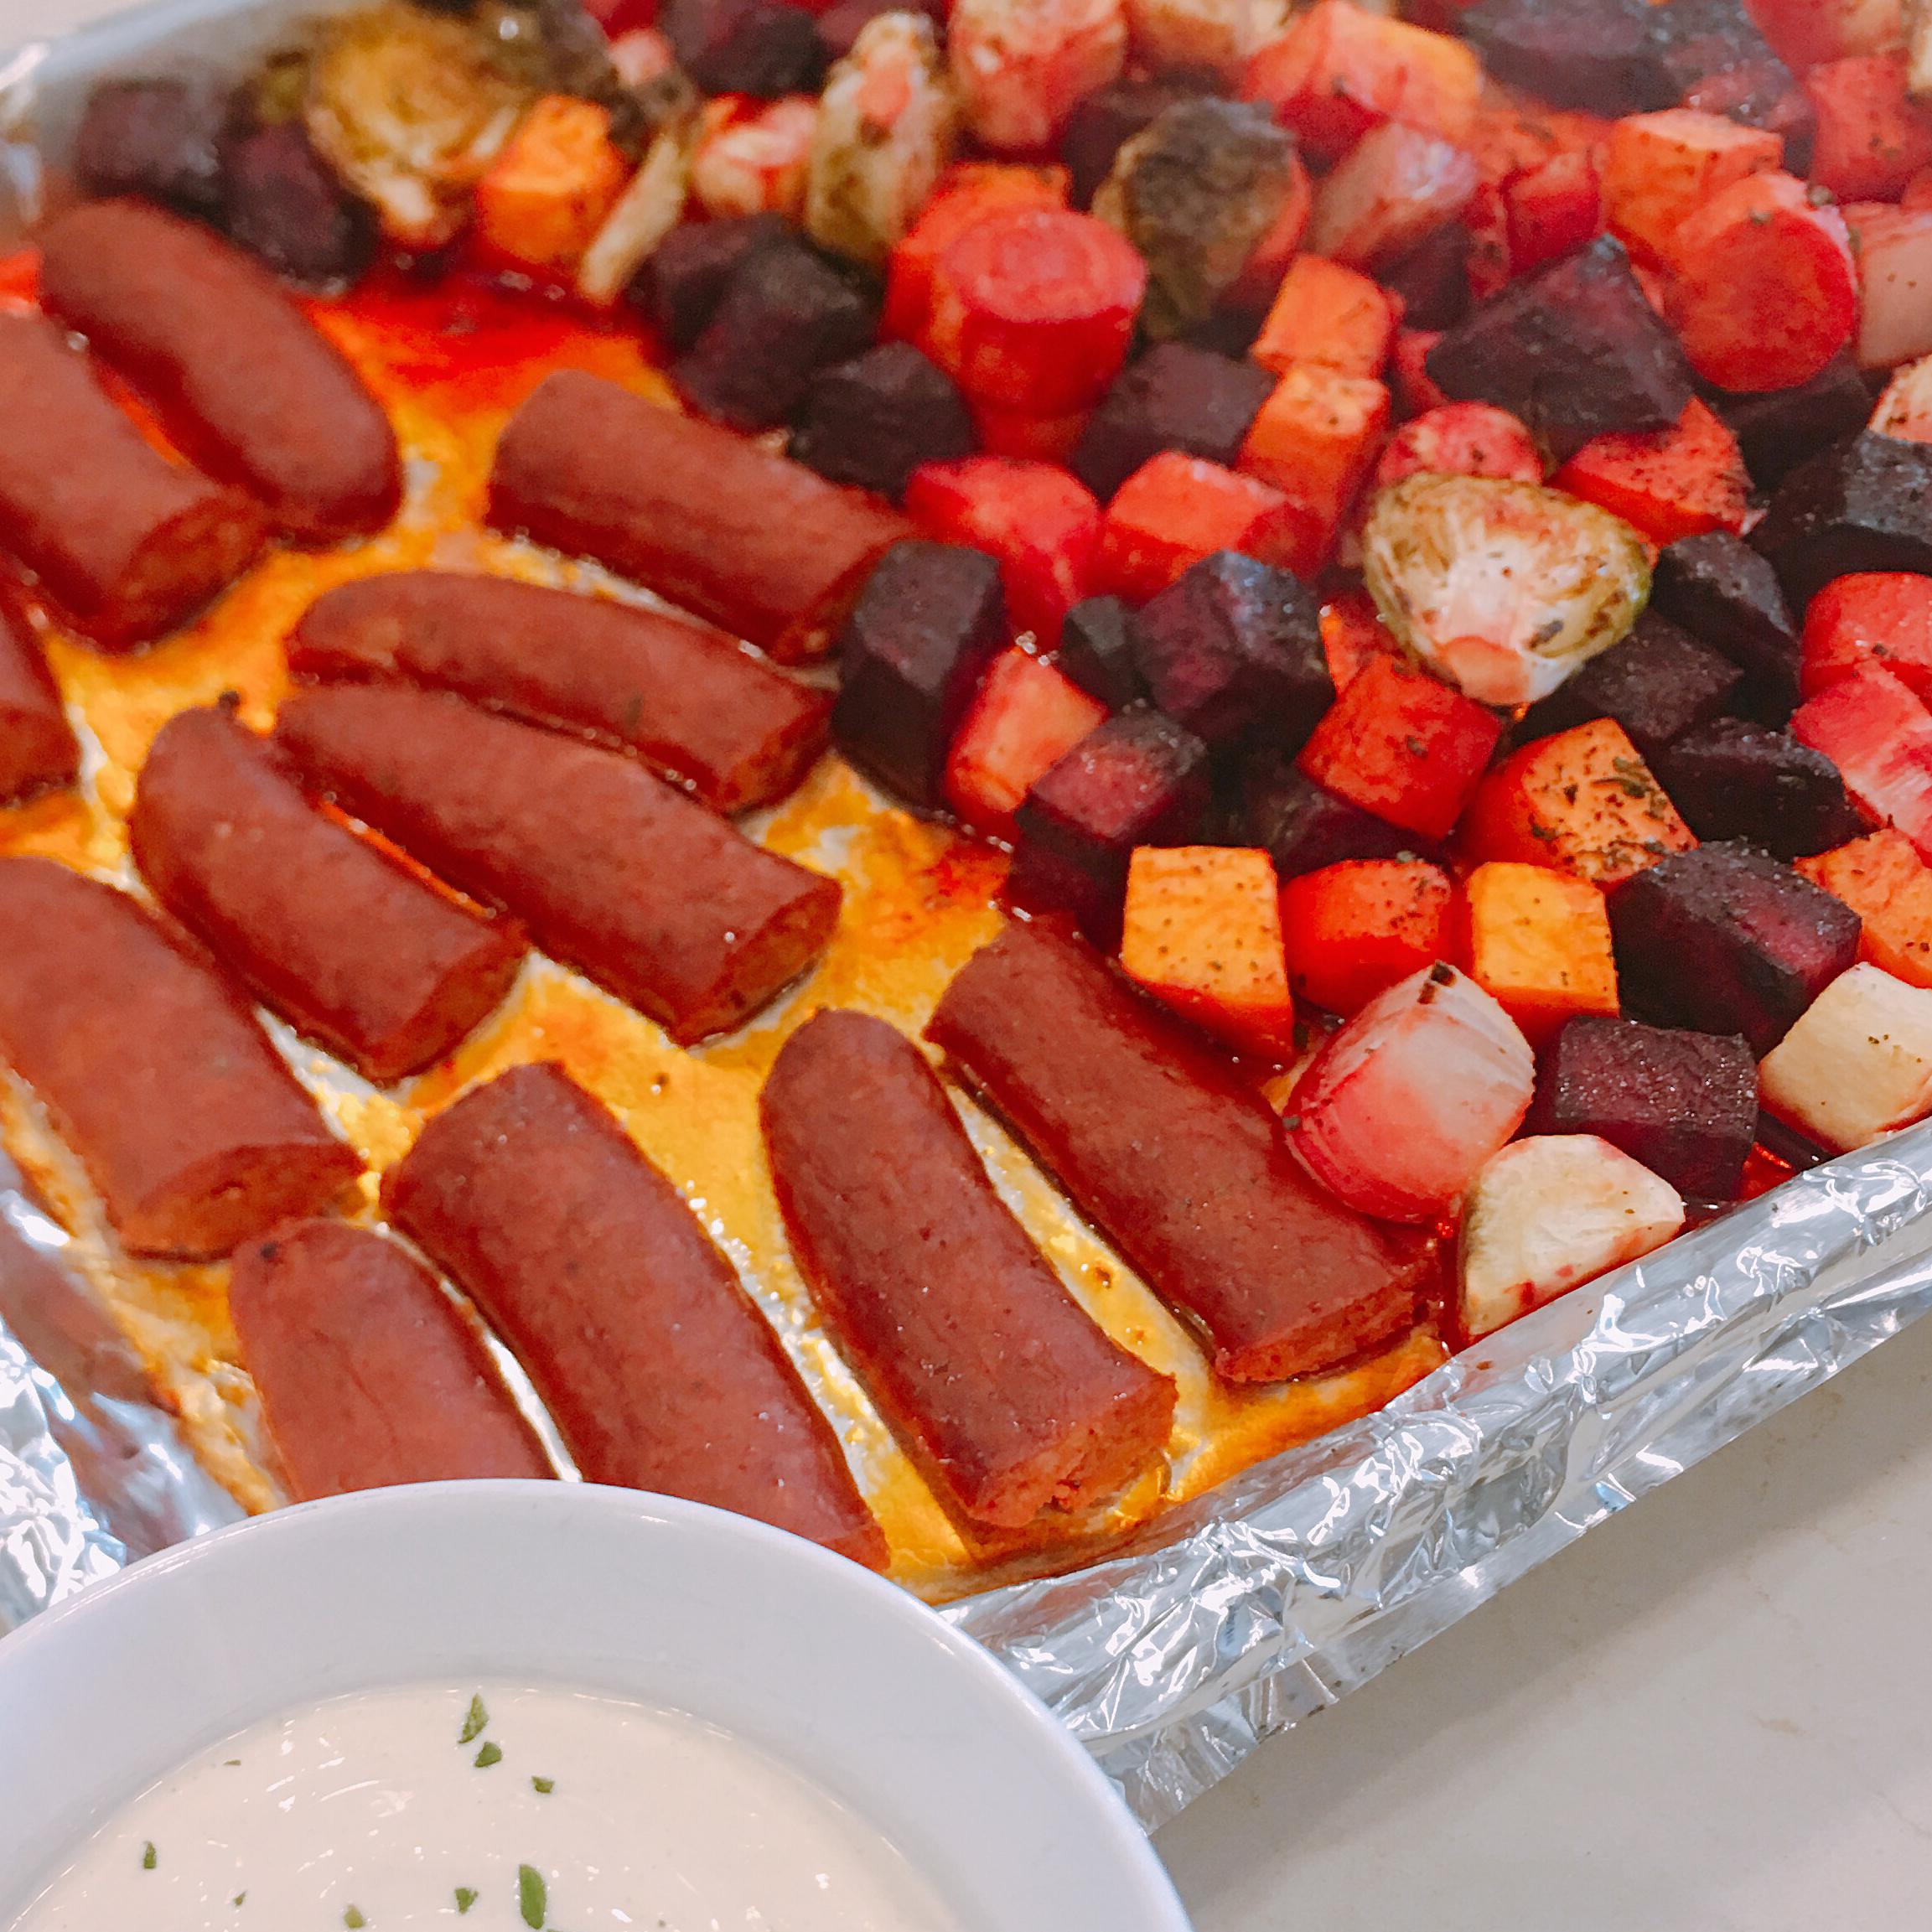 Hillshire Farm® Smoked Sausage and Roasted Root Veggies charlie